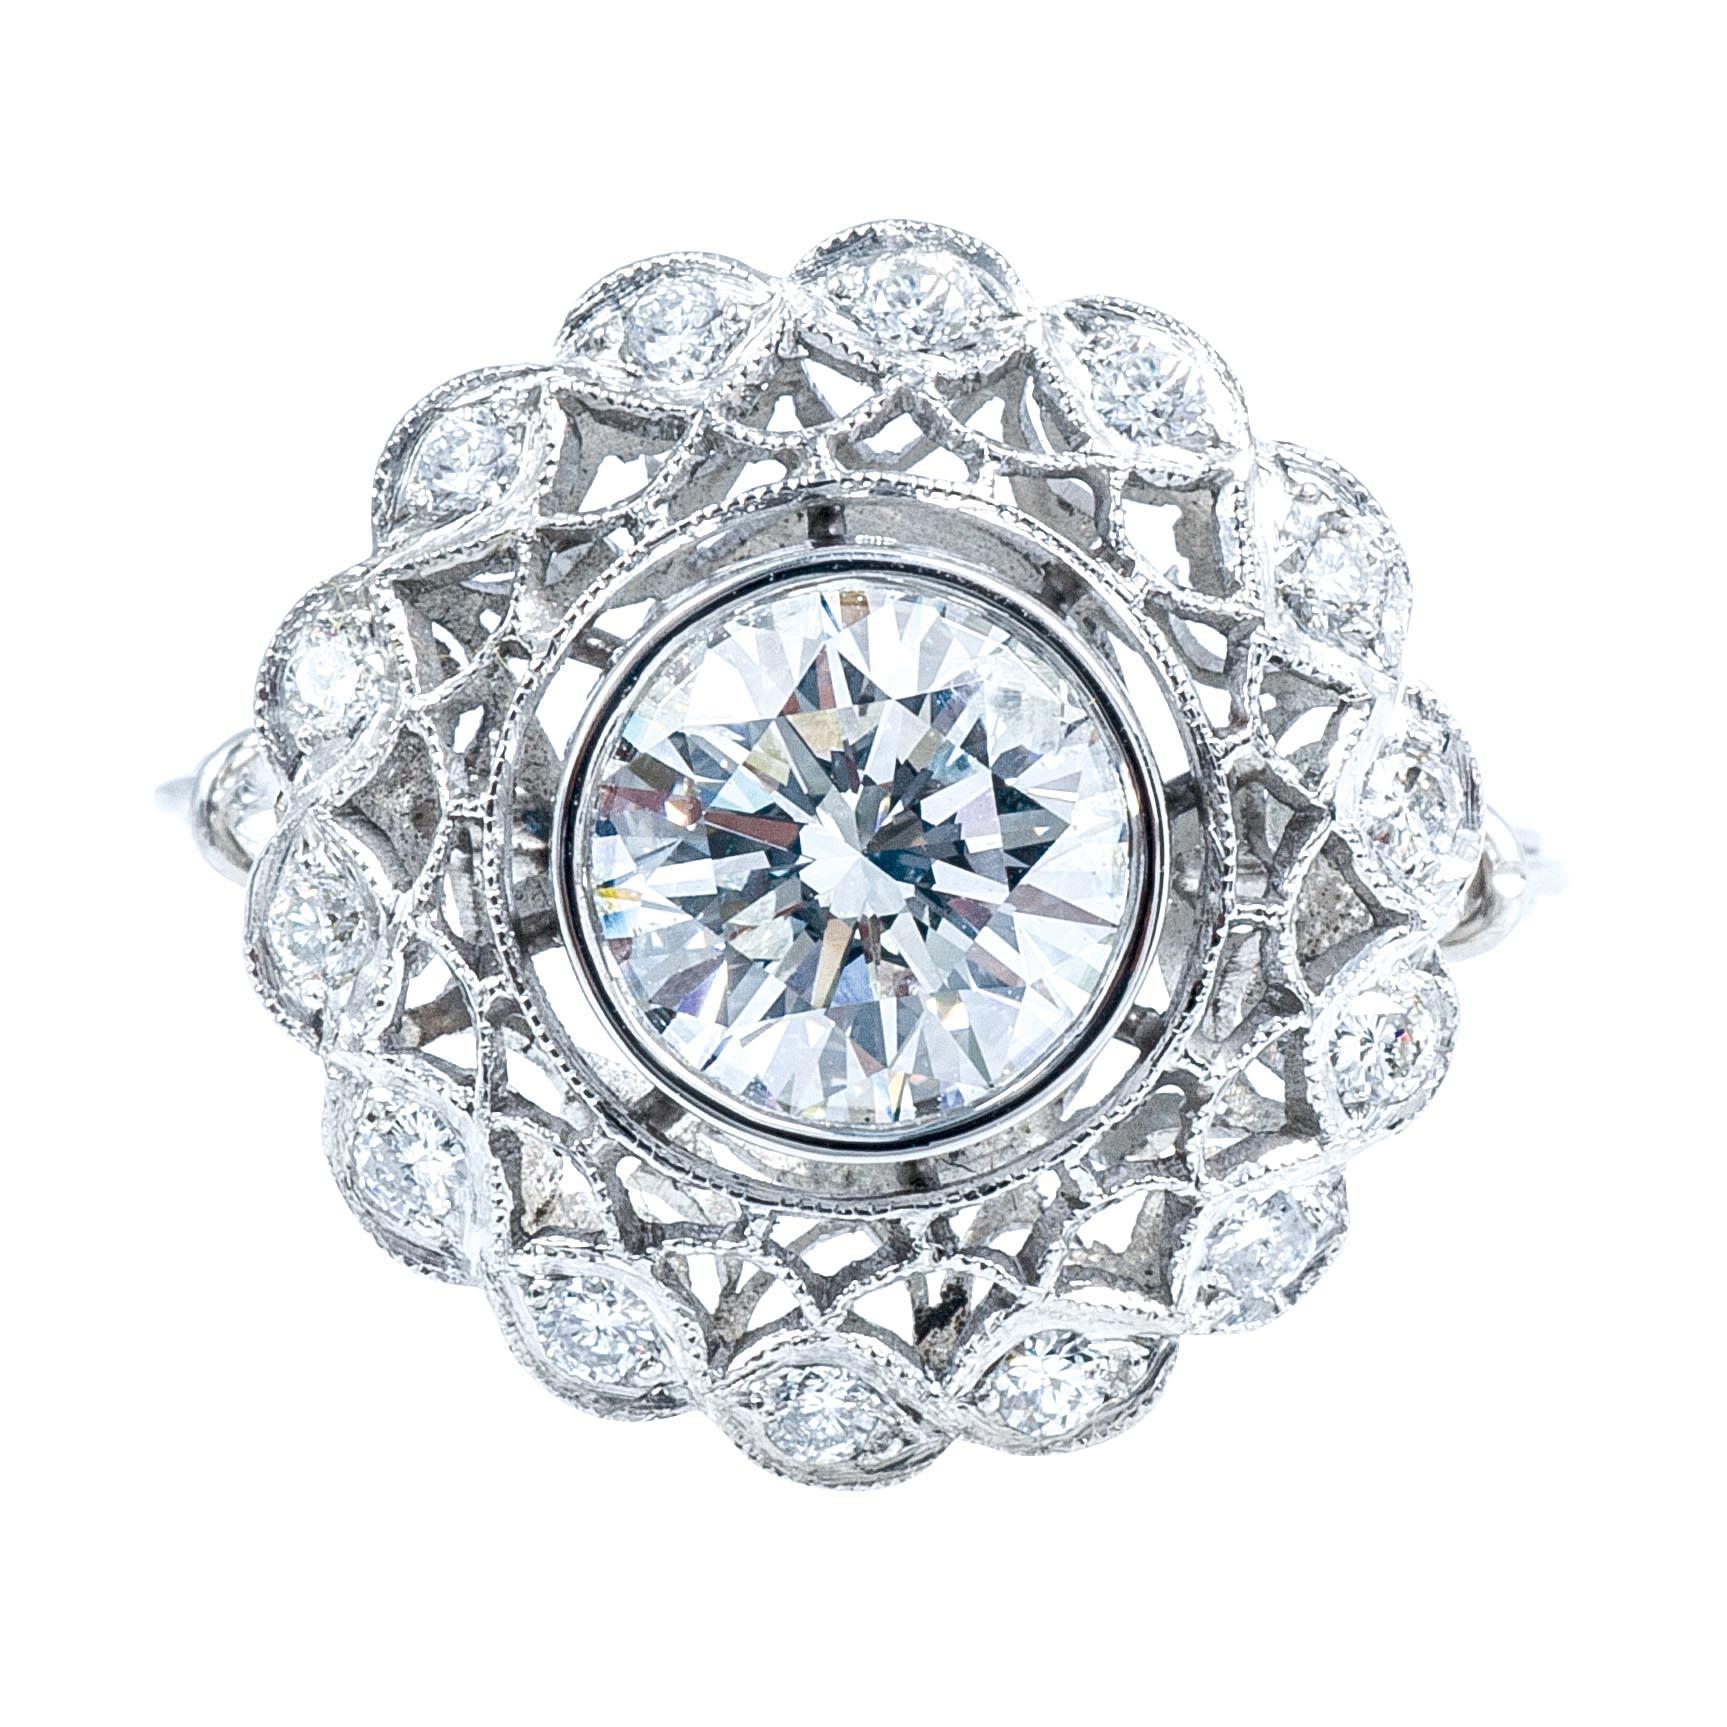 New Art Deco-Inspired 1.85 CTW Diamond Halo Engagement Ring